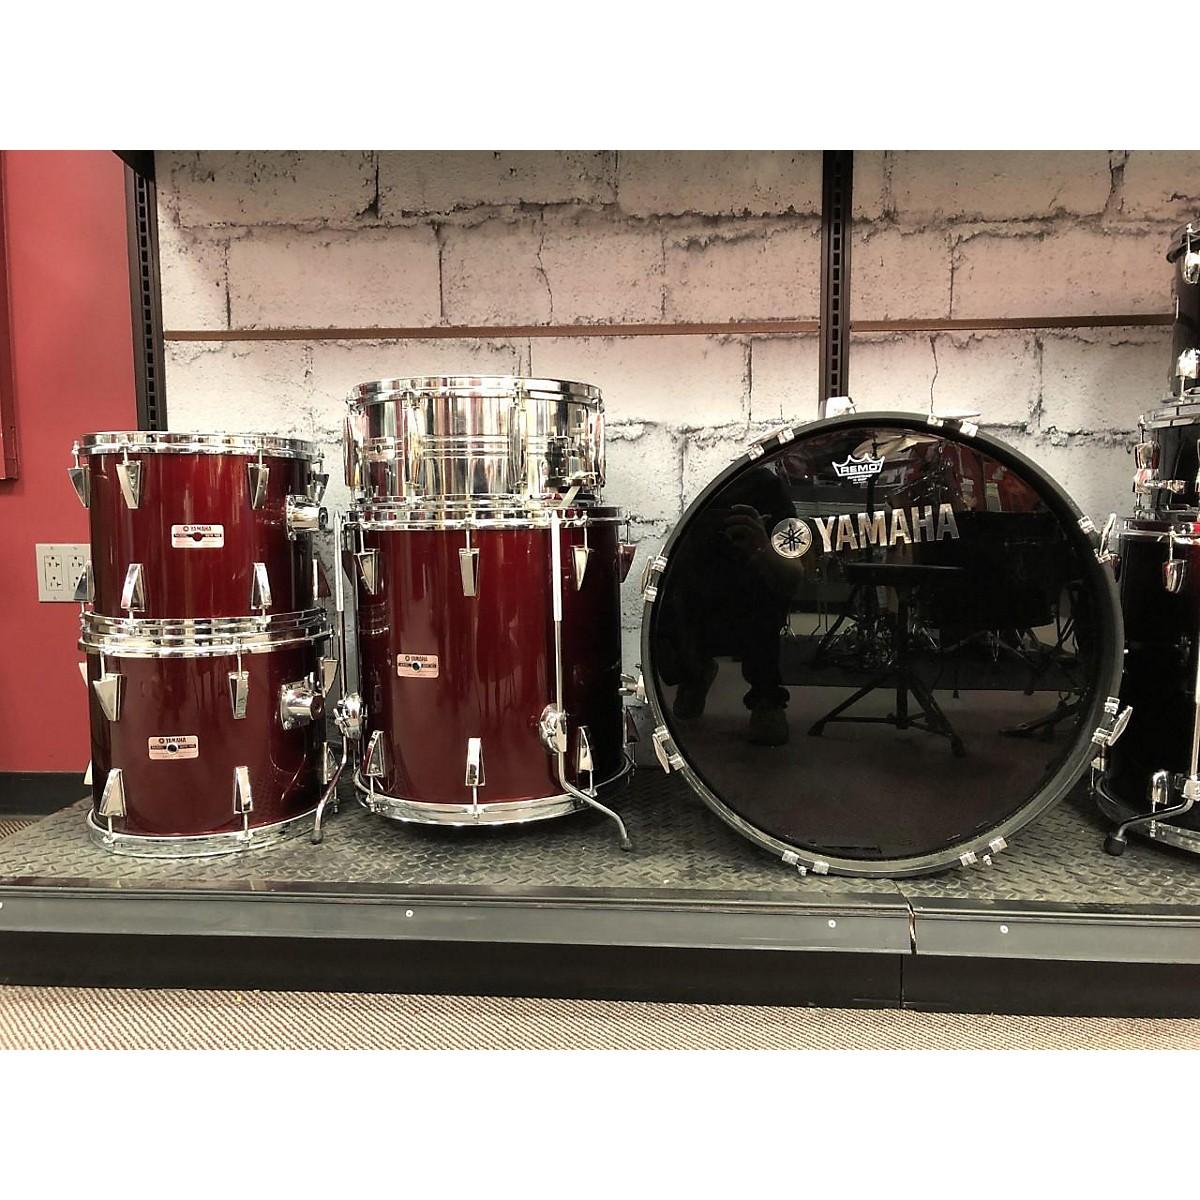 Yamaha 5000 Series Drum Kit